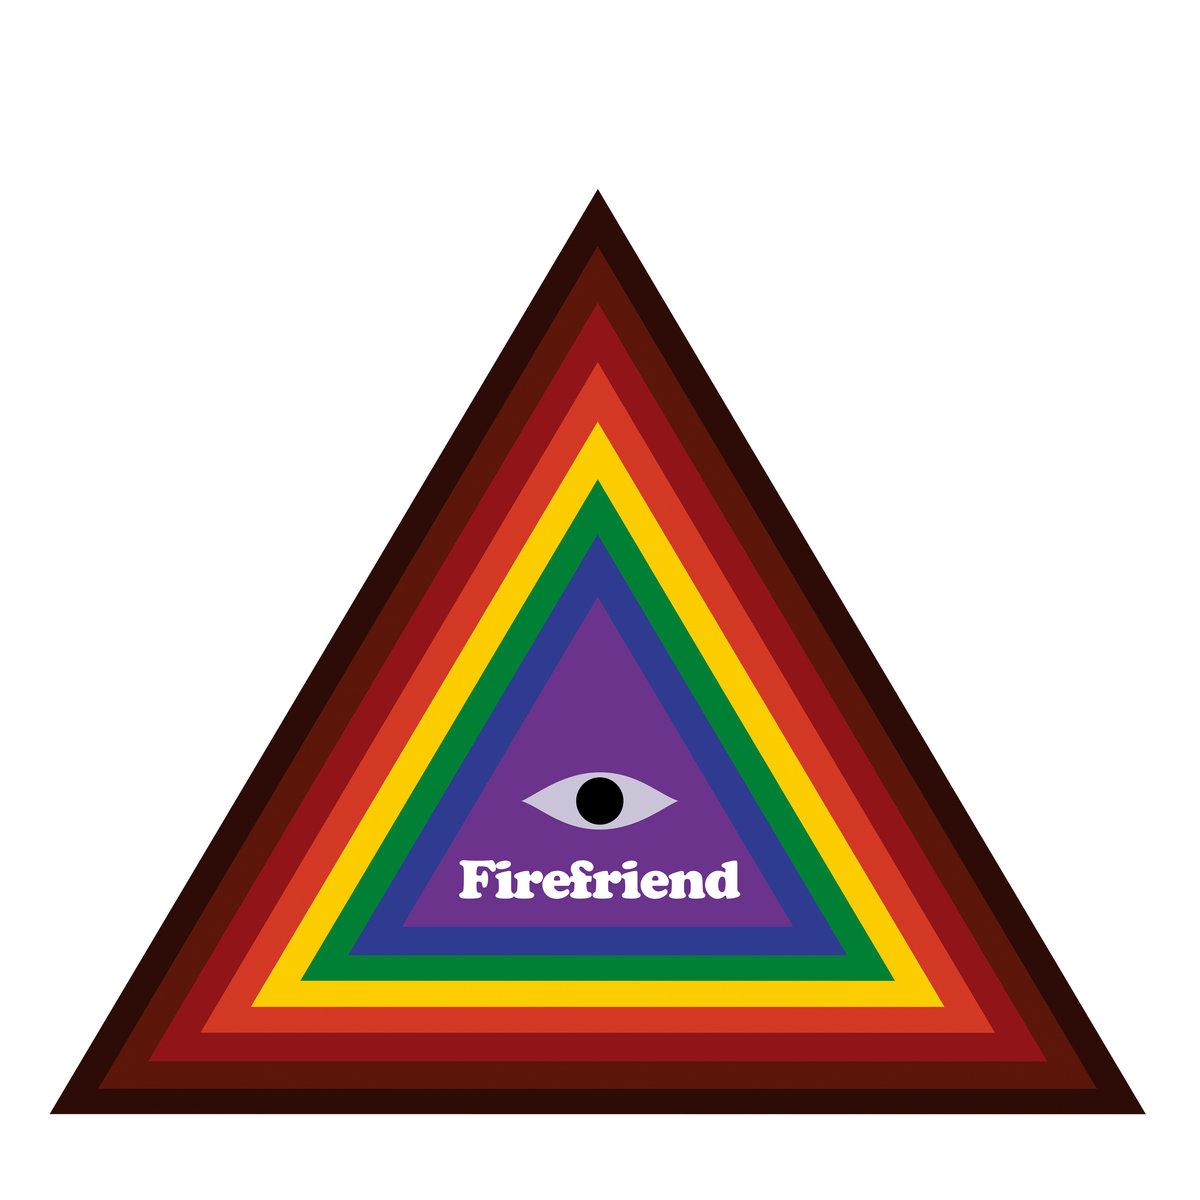 Firefriend Dead Icons